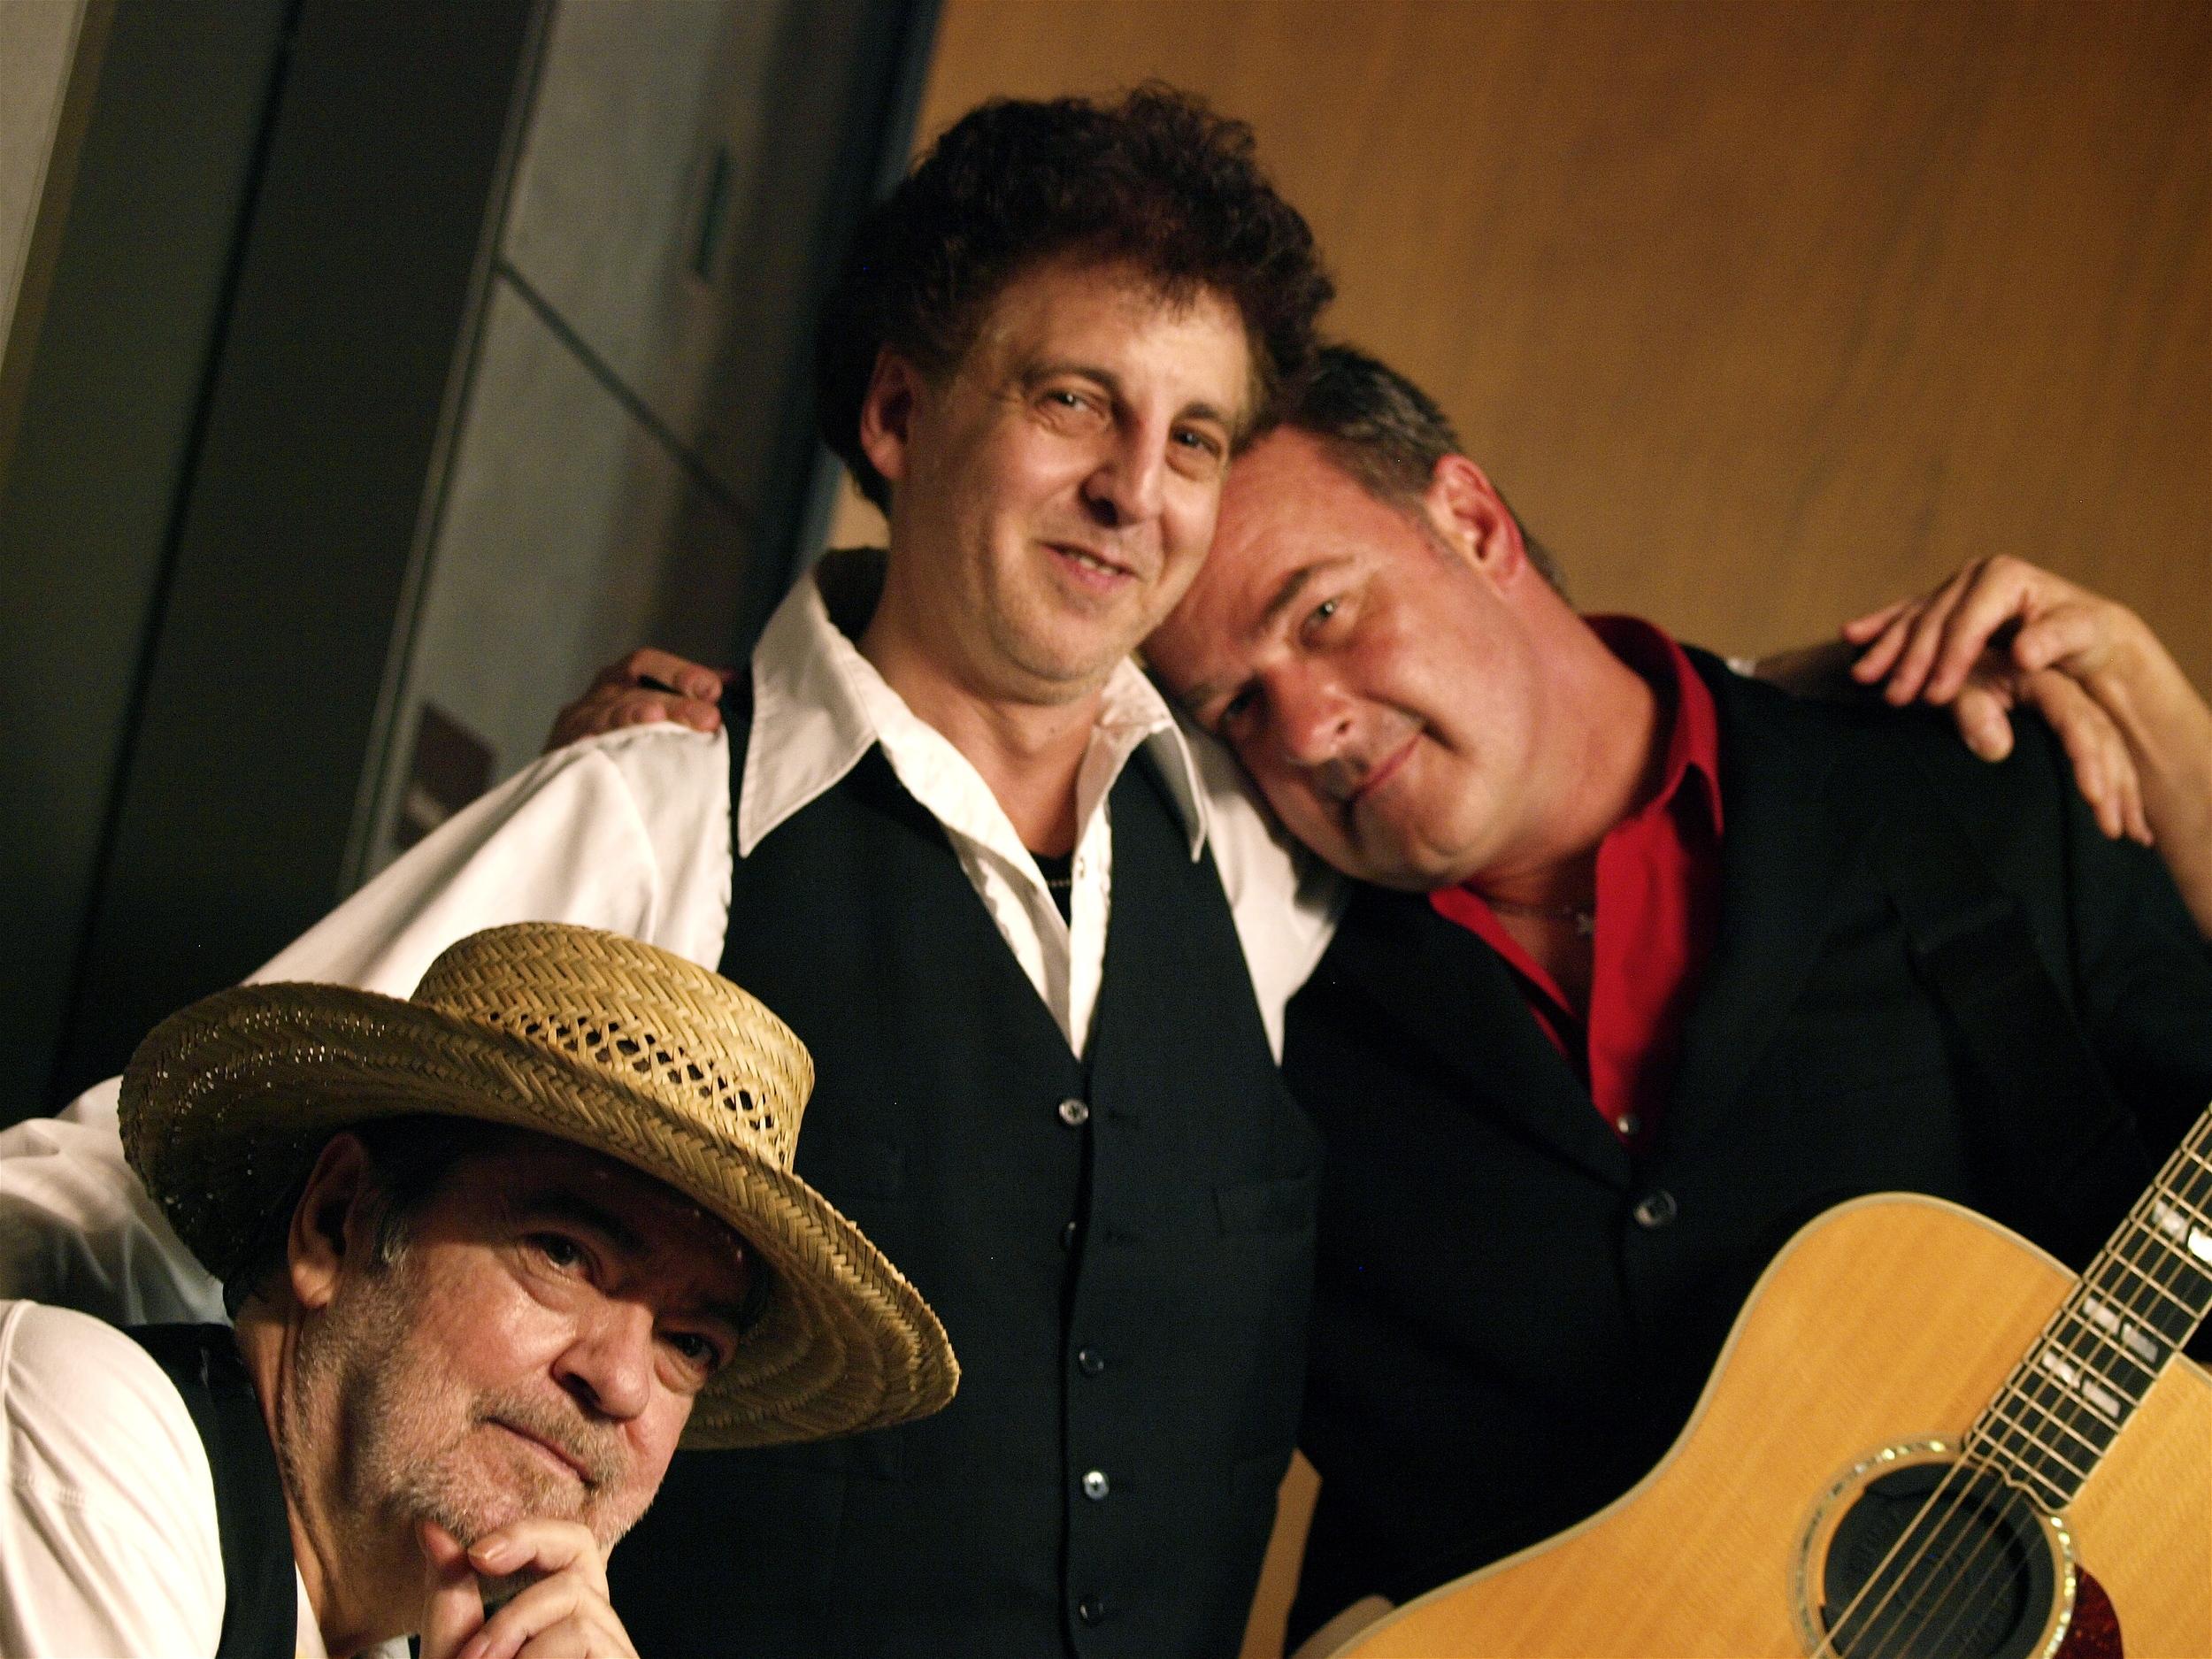 Barry Thomas Goldberg, Magic Marc and James Loney / Town Green Amphitheatre / Maple Grove, Minnesota / August 6th, 2014 / Photo by Neil Schloner